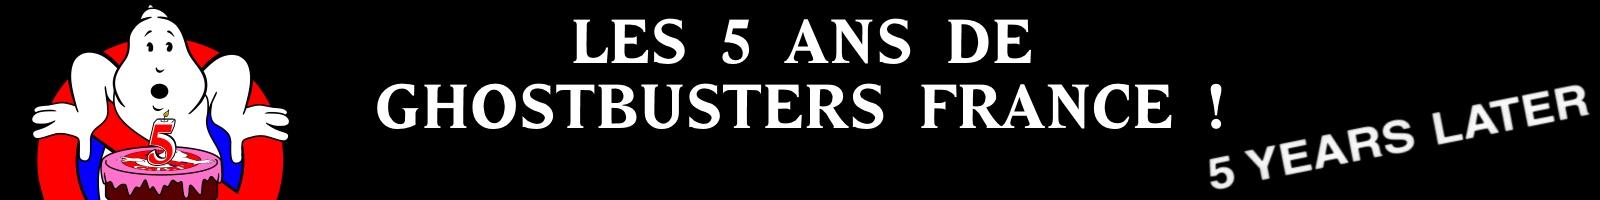 http://www.ghostbusters-france.net/les-5-ans-de-ghostbusters-france/